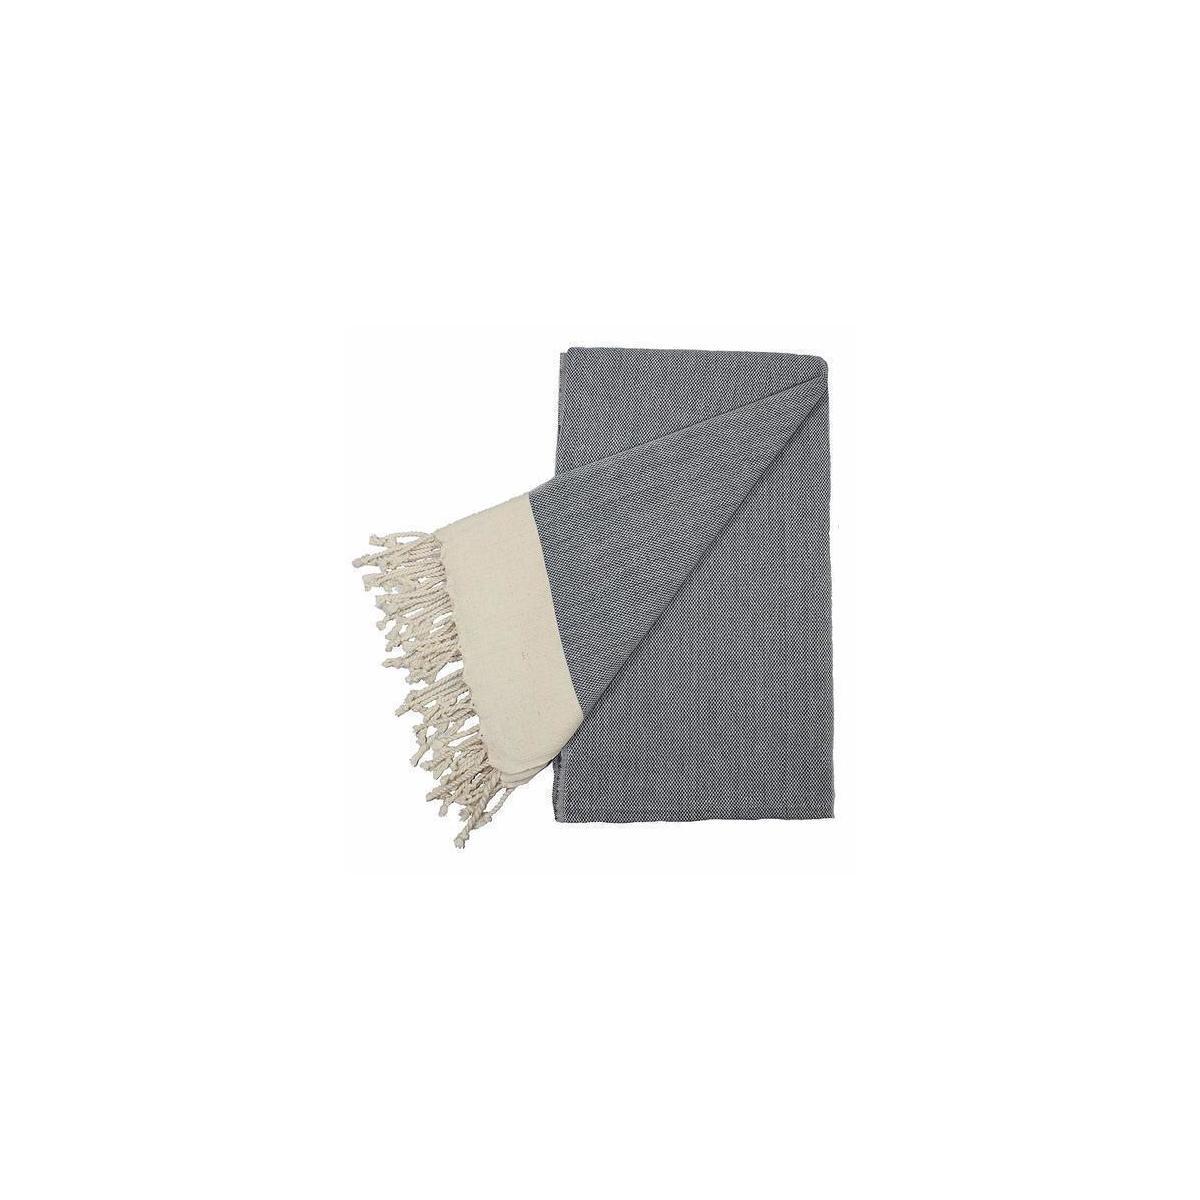 Remizone Peshtemal Towel, Premium 100% Cotton,Turkish Beach Towel, Handloom Bath Towel (Navy Blue)